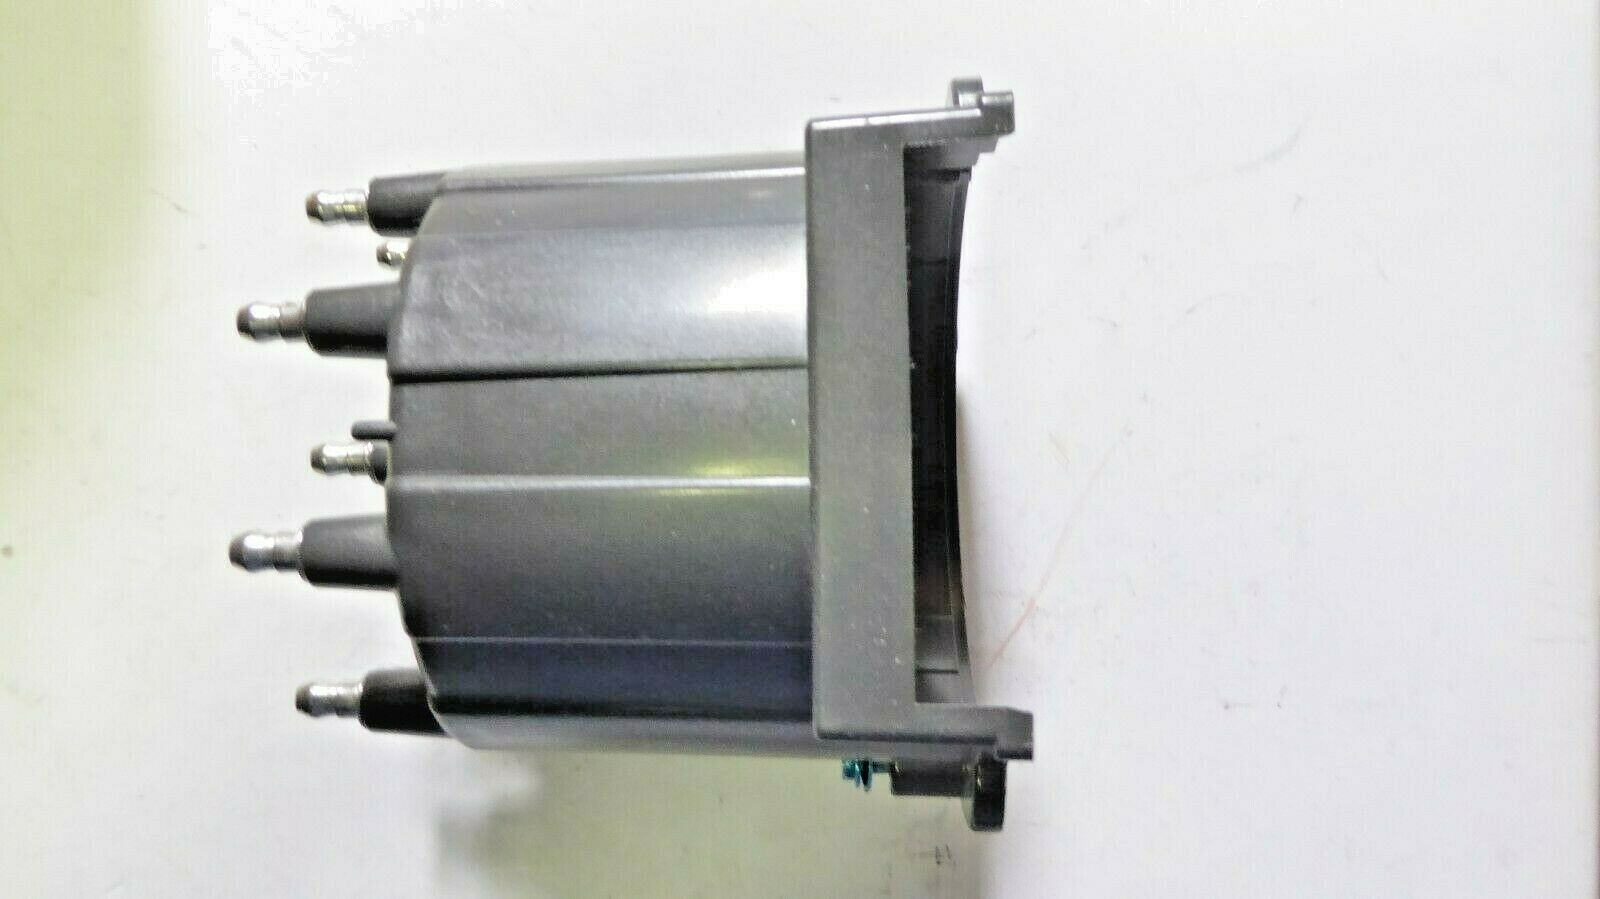 NAPA Proformer RR249SB Distributor Cap New